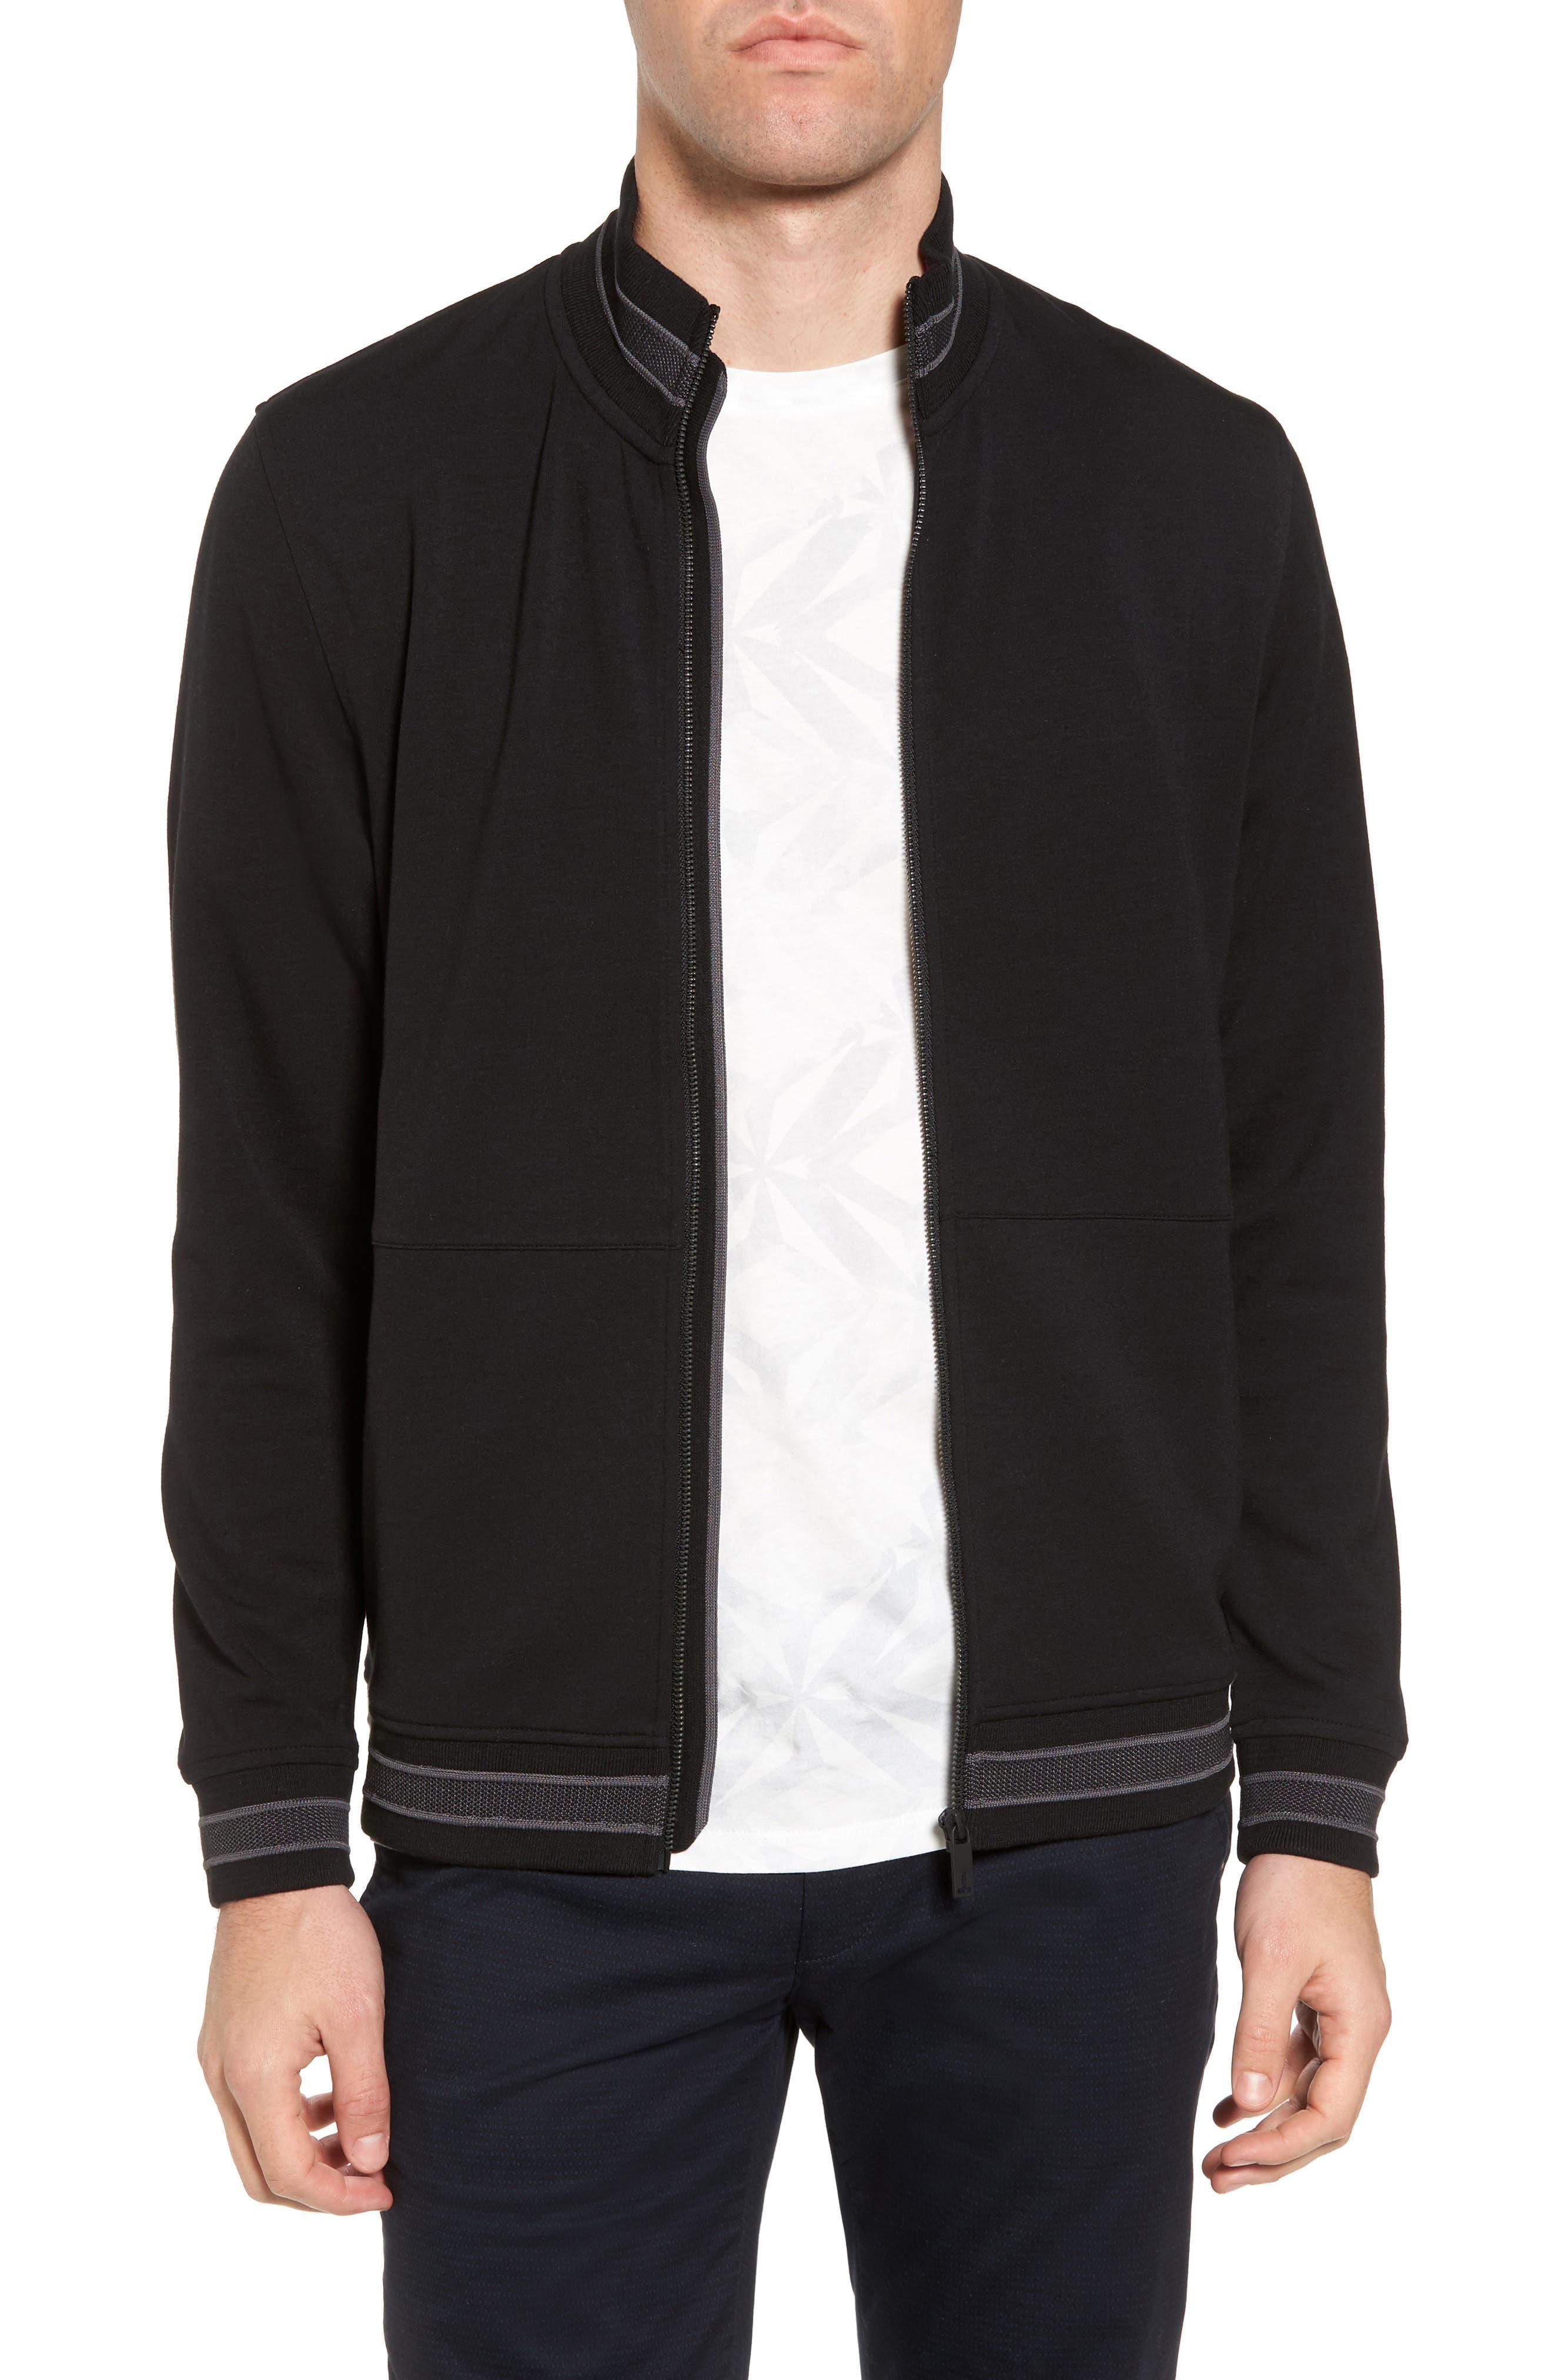 Collie Jersey Zip Jacket,                             Main thumbnail 1, color,                             001